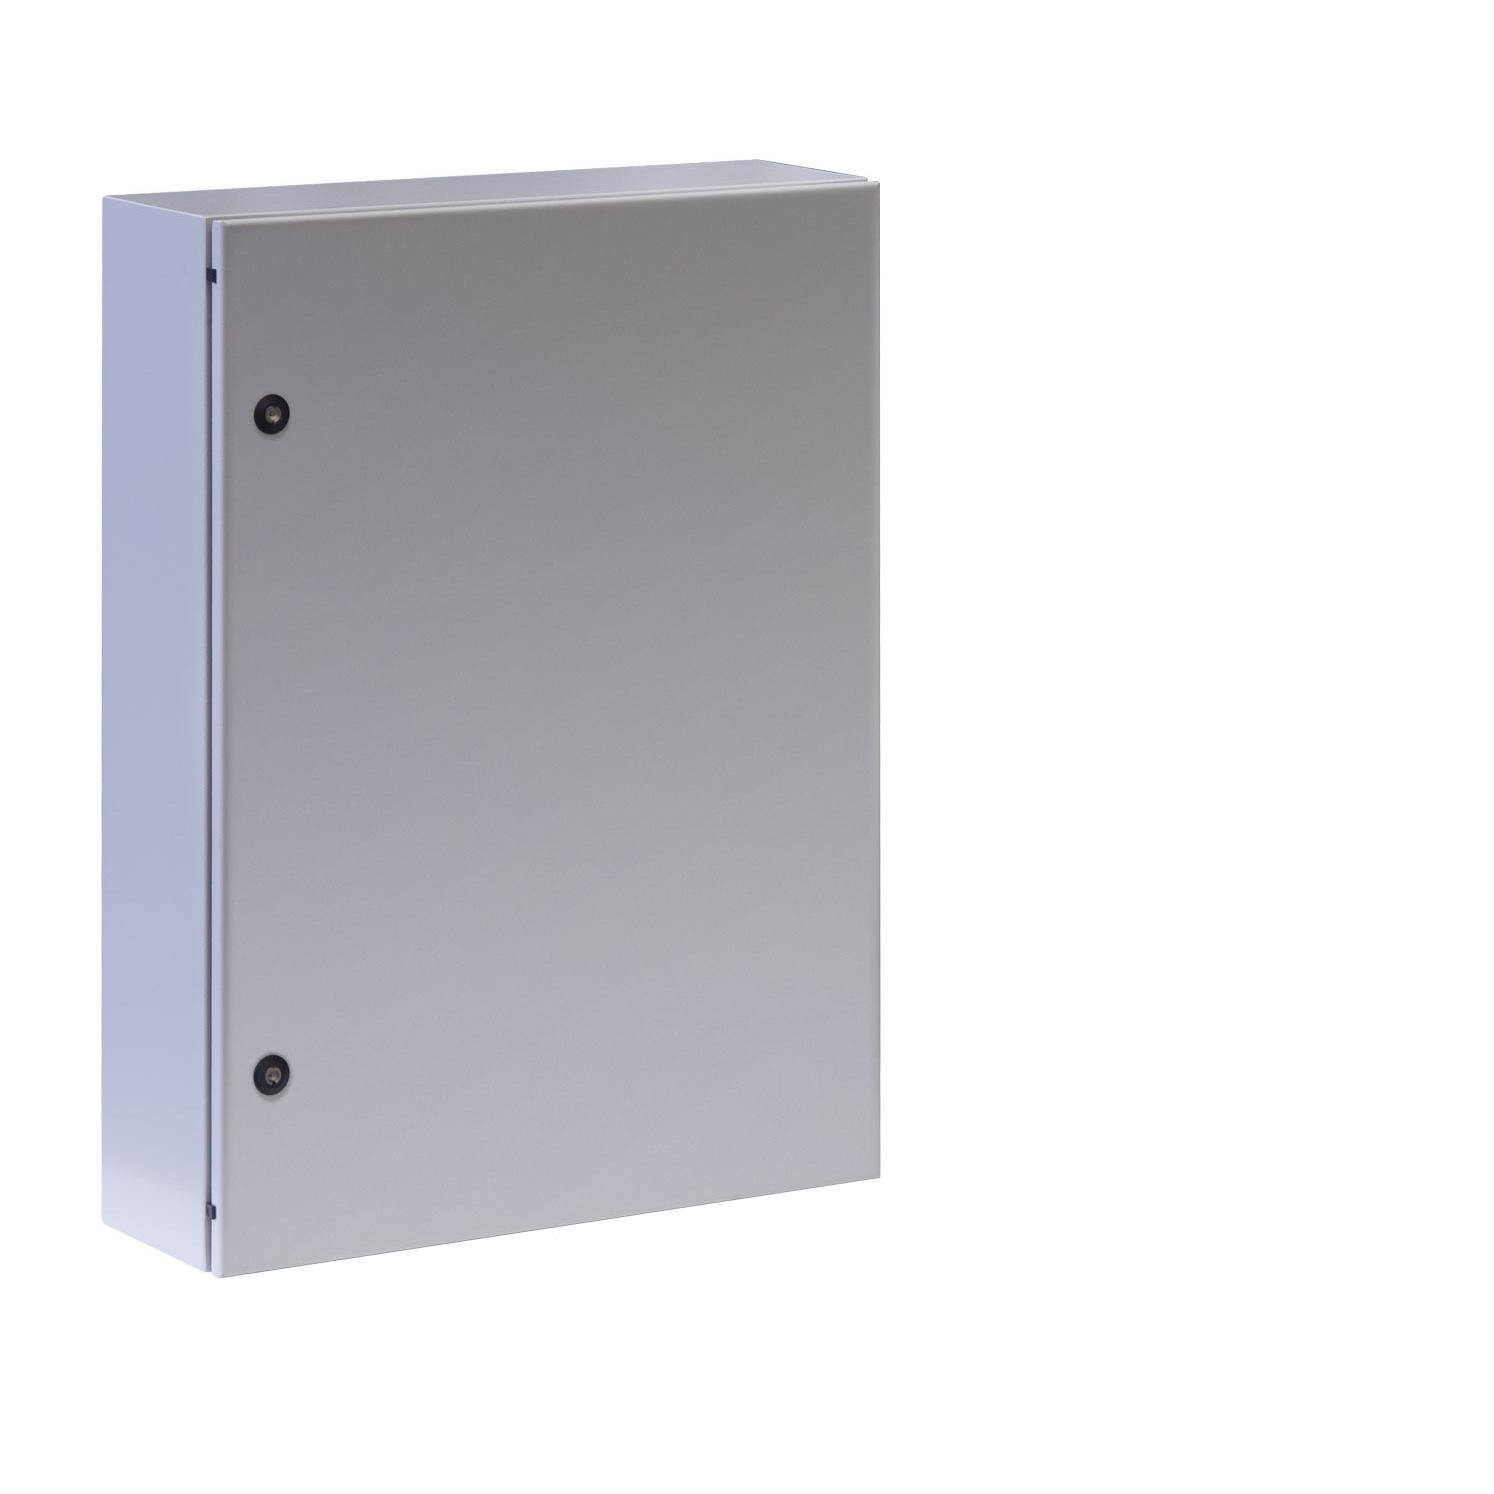 Armadio Rack 19'' a muro 17U grigio IP65 porta cieca prof. 200mm